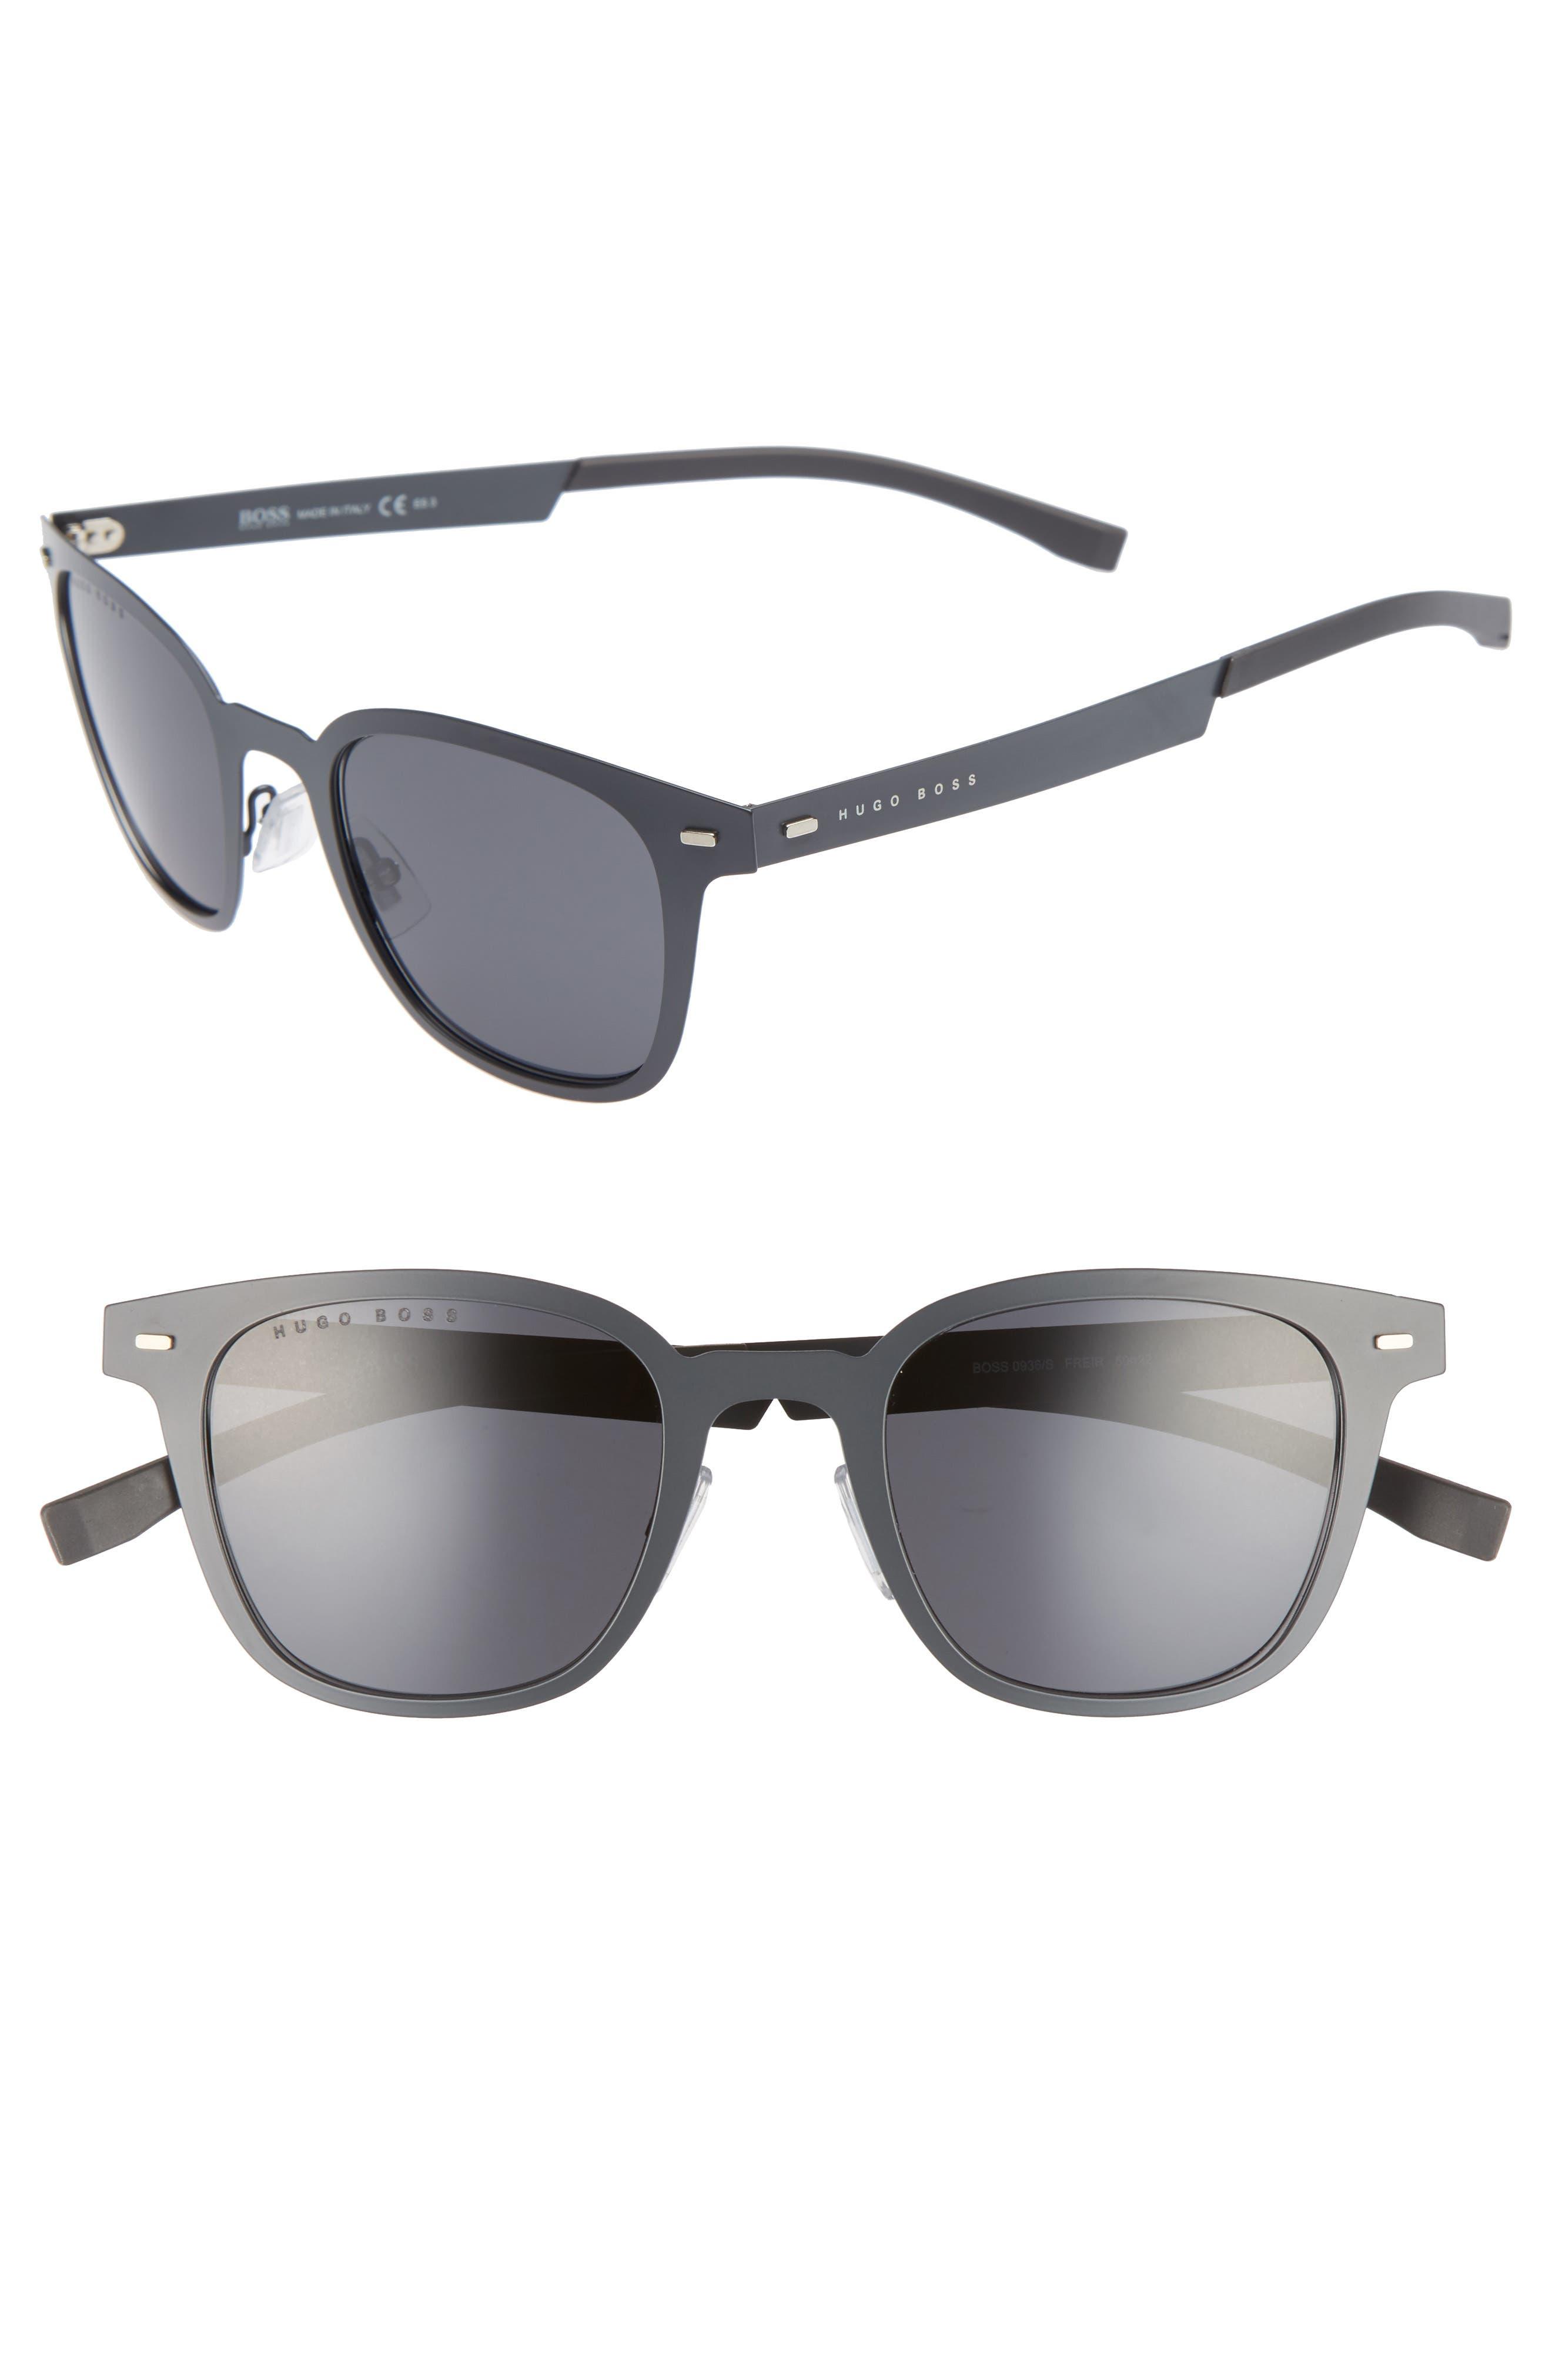 BOSS 50mm Sunglasses